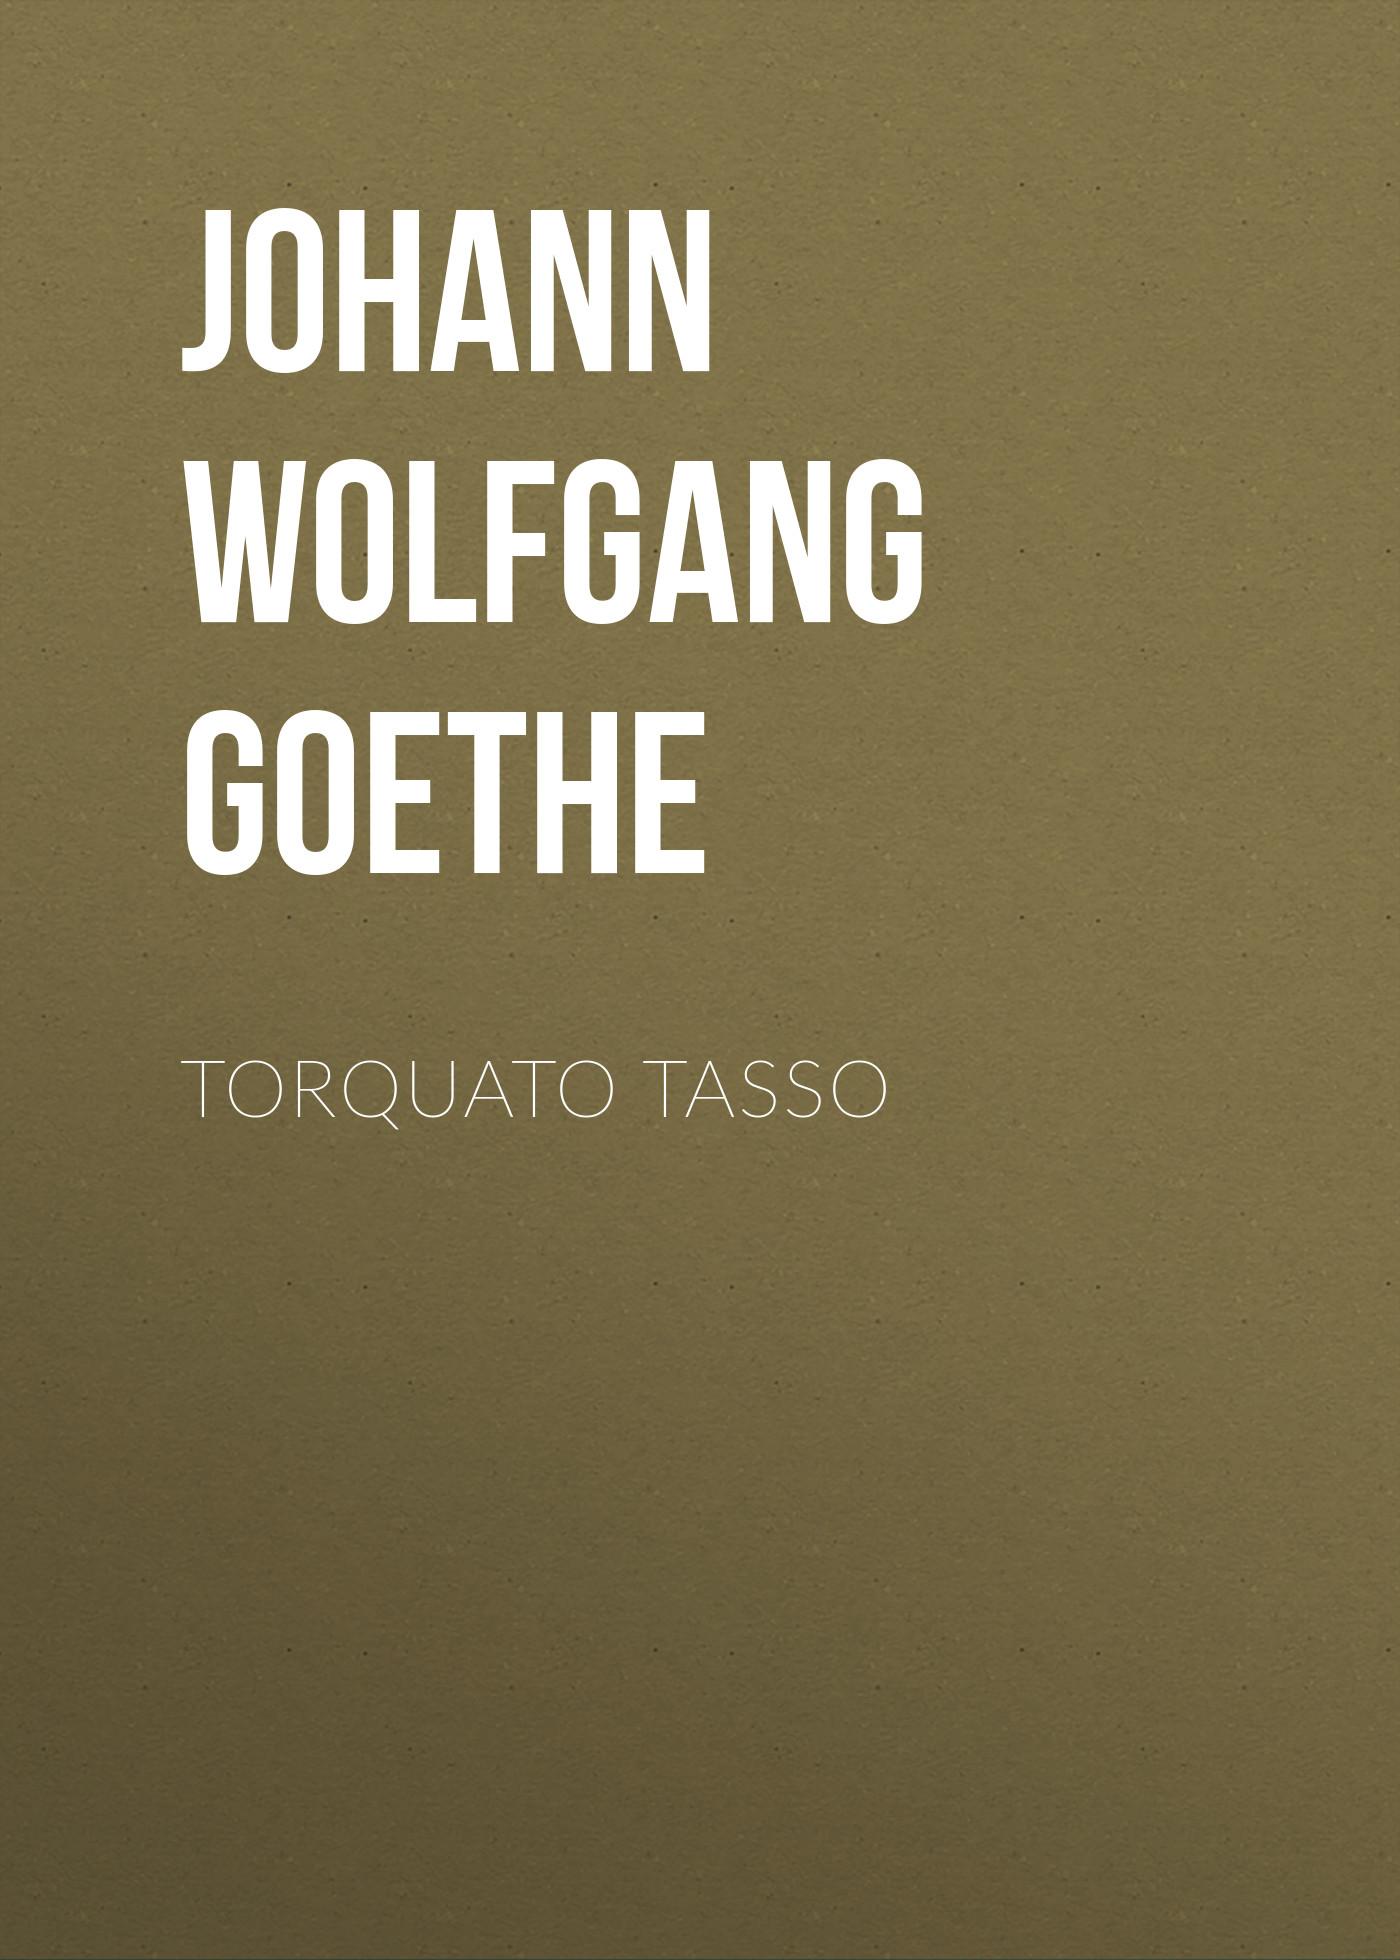 Иоганн Вольфганг фон Гёте Torquato Tasso иоганн вольфганг фон гёте die aufgeregten